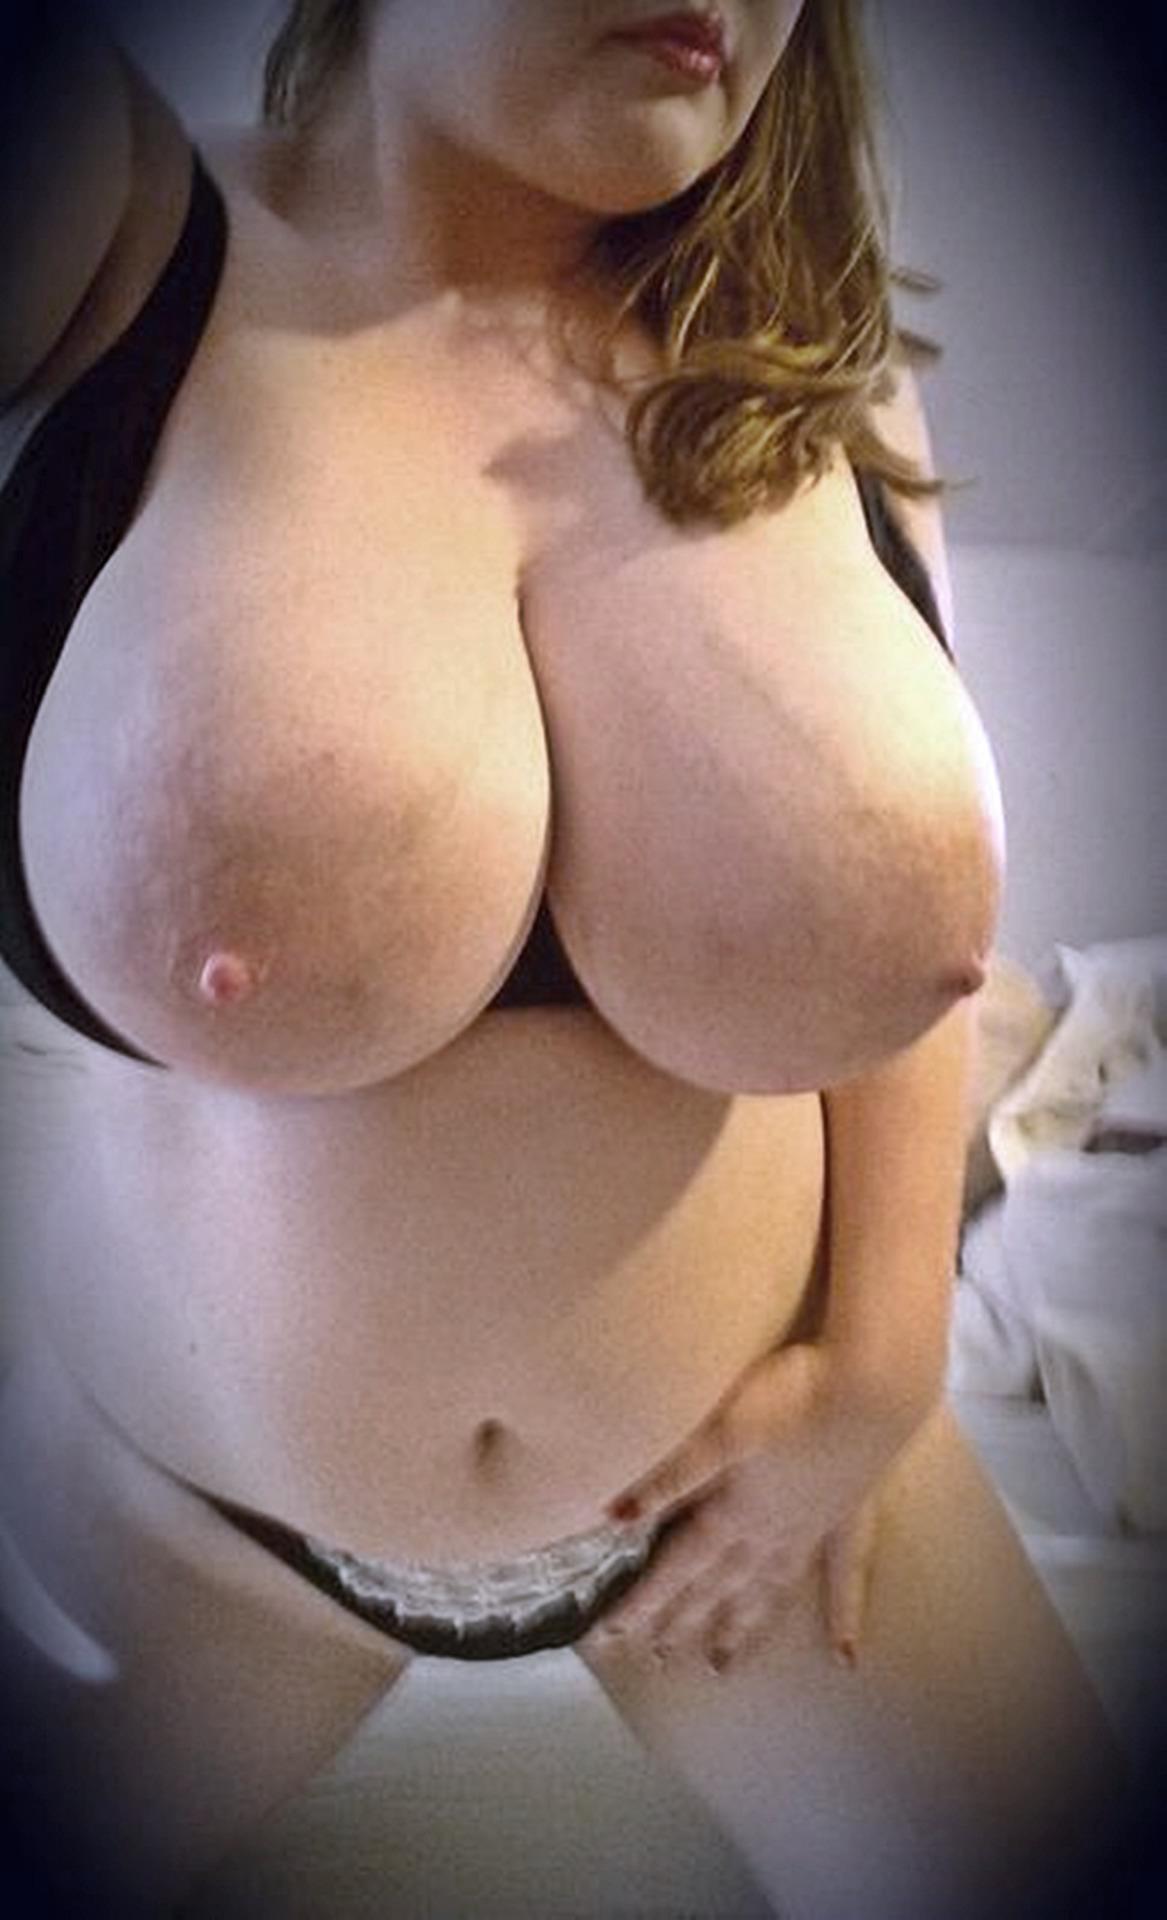 Blonde à gros seins cherche plan sexe occasionnel